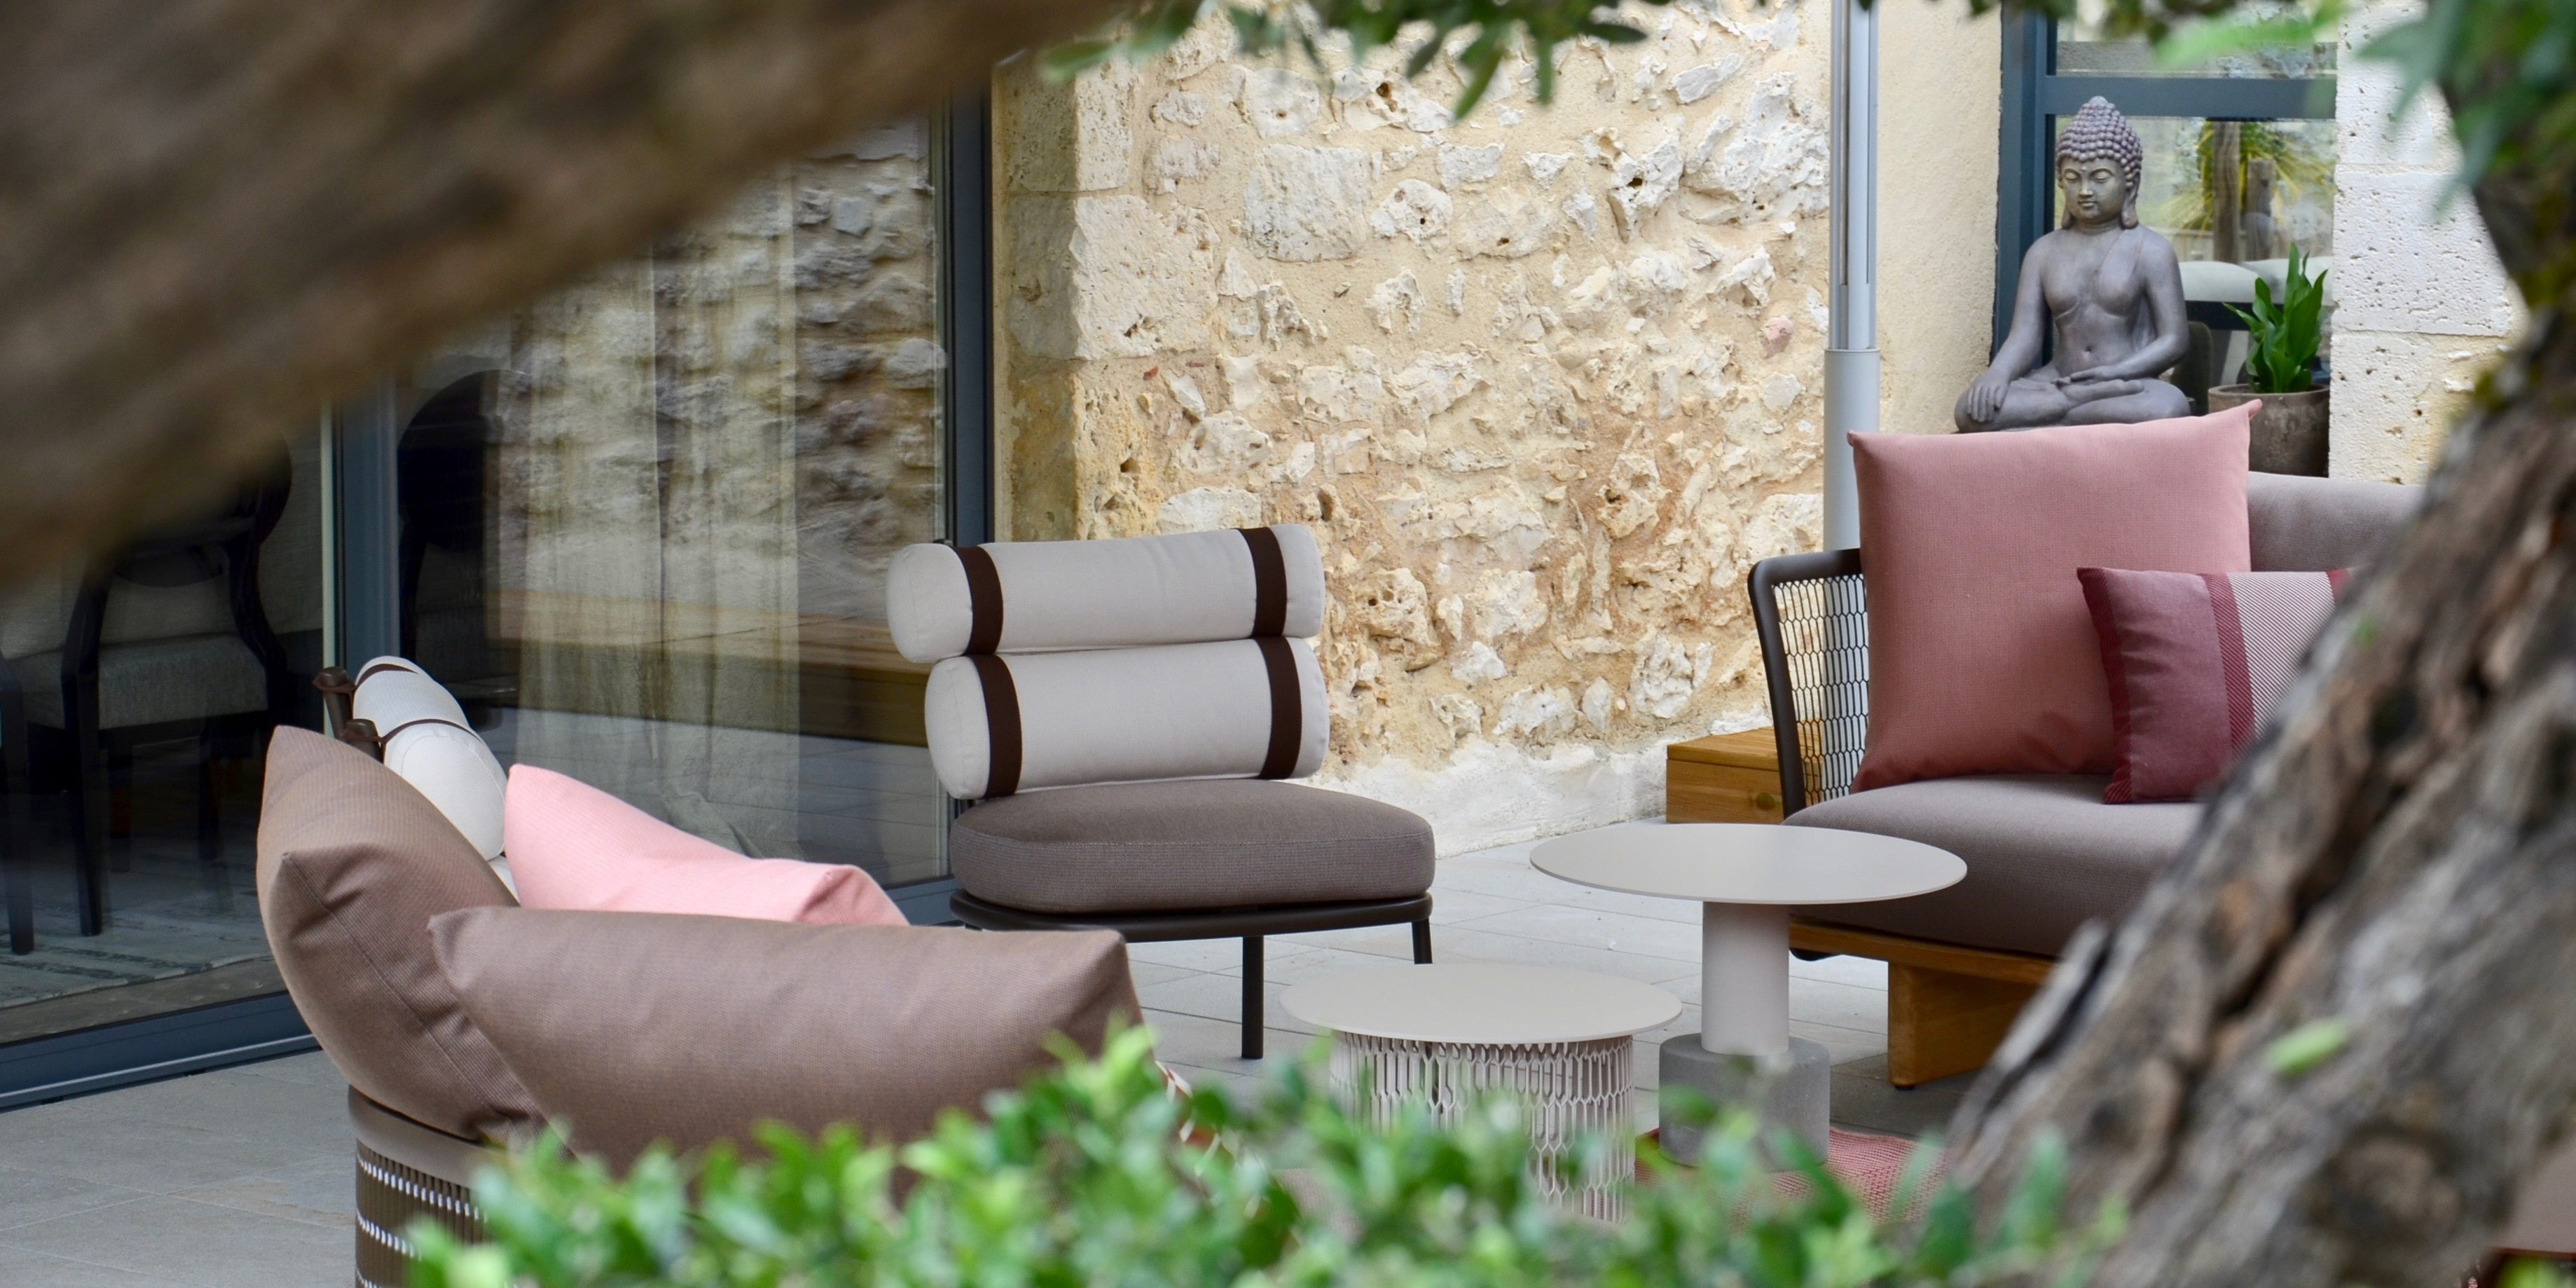 BUXUS Salon de jardin haut de gamme - Buxus / Mobilier outdoor